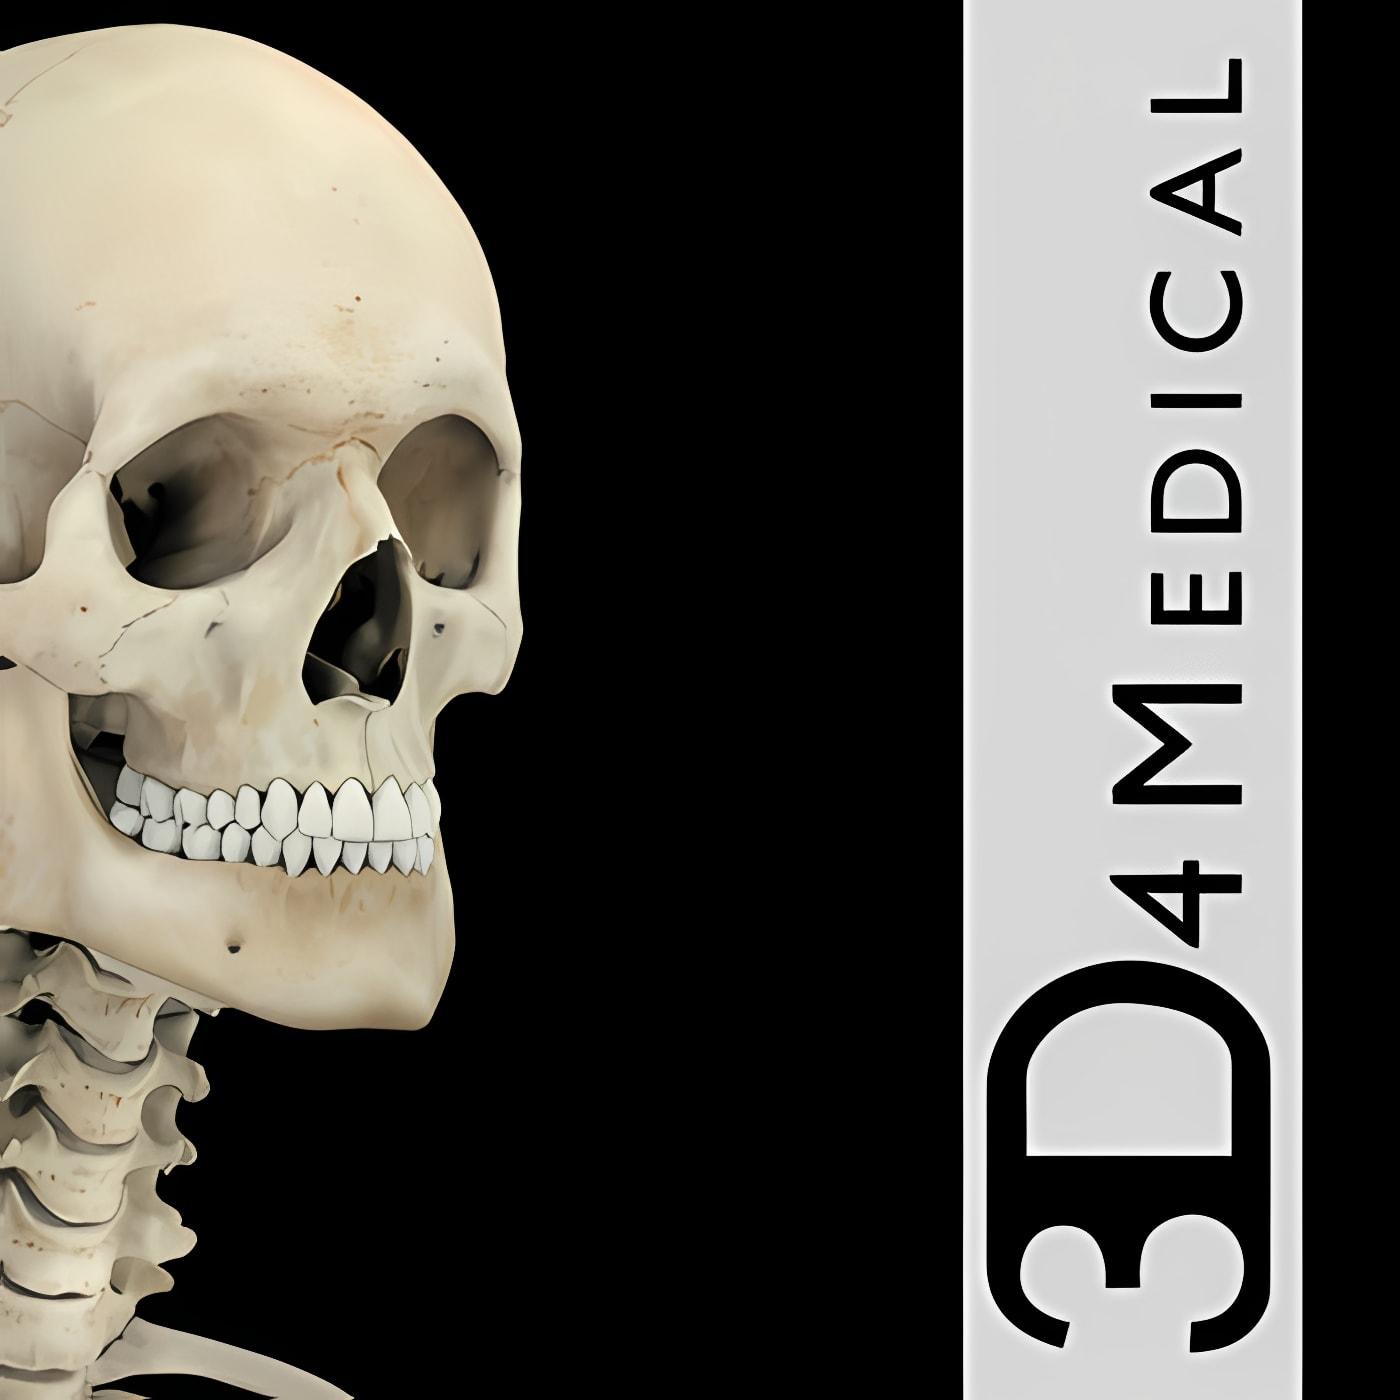 Skeletal System Pro III